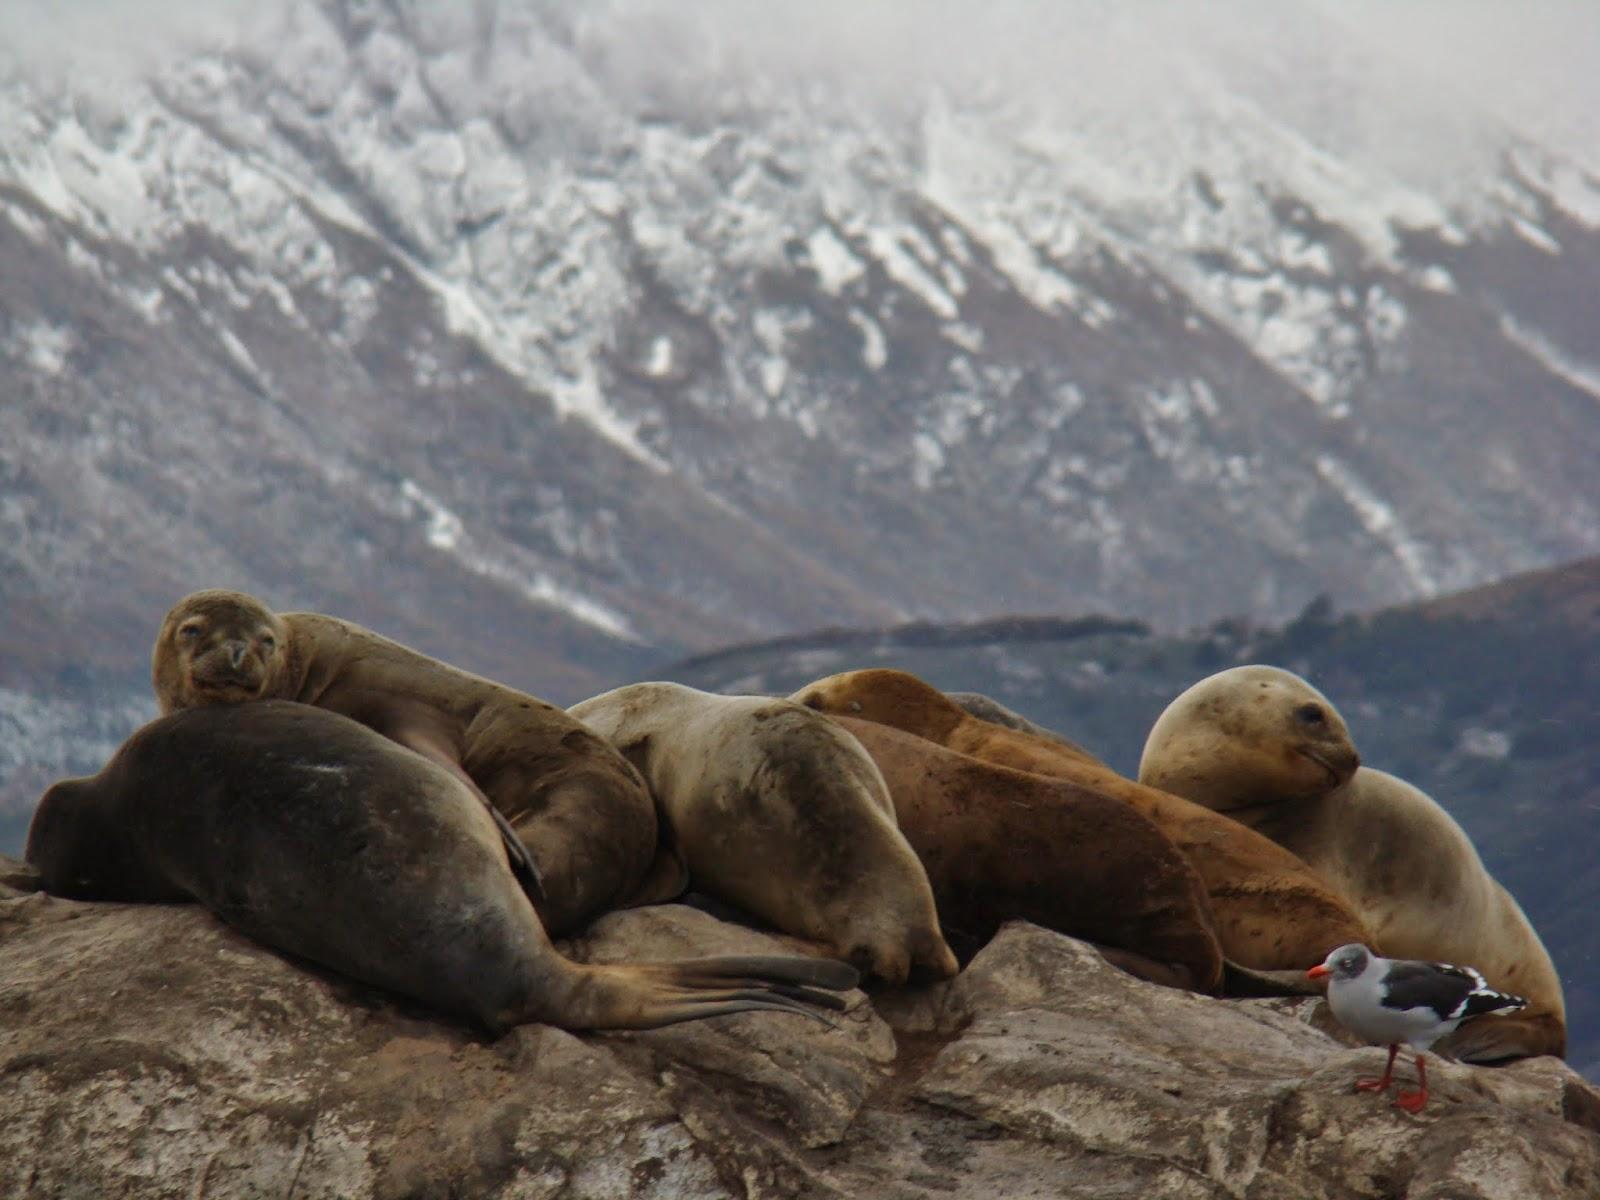 Canal de Beagle, Ushuaia, Argentina, Elisa N, Blog de Viajes, Lifestyle, Travel, Lobos marinos